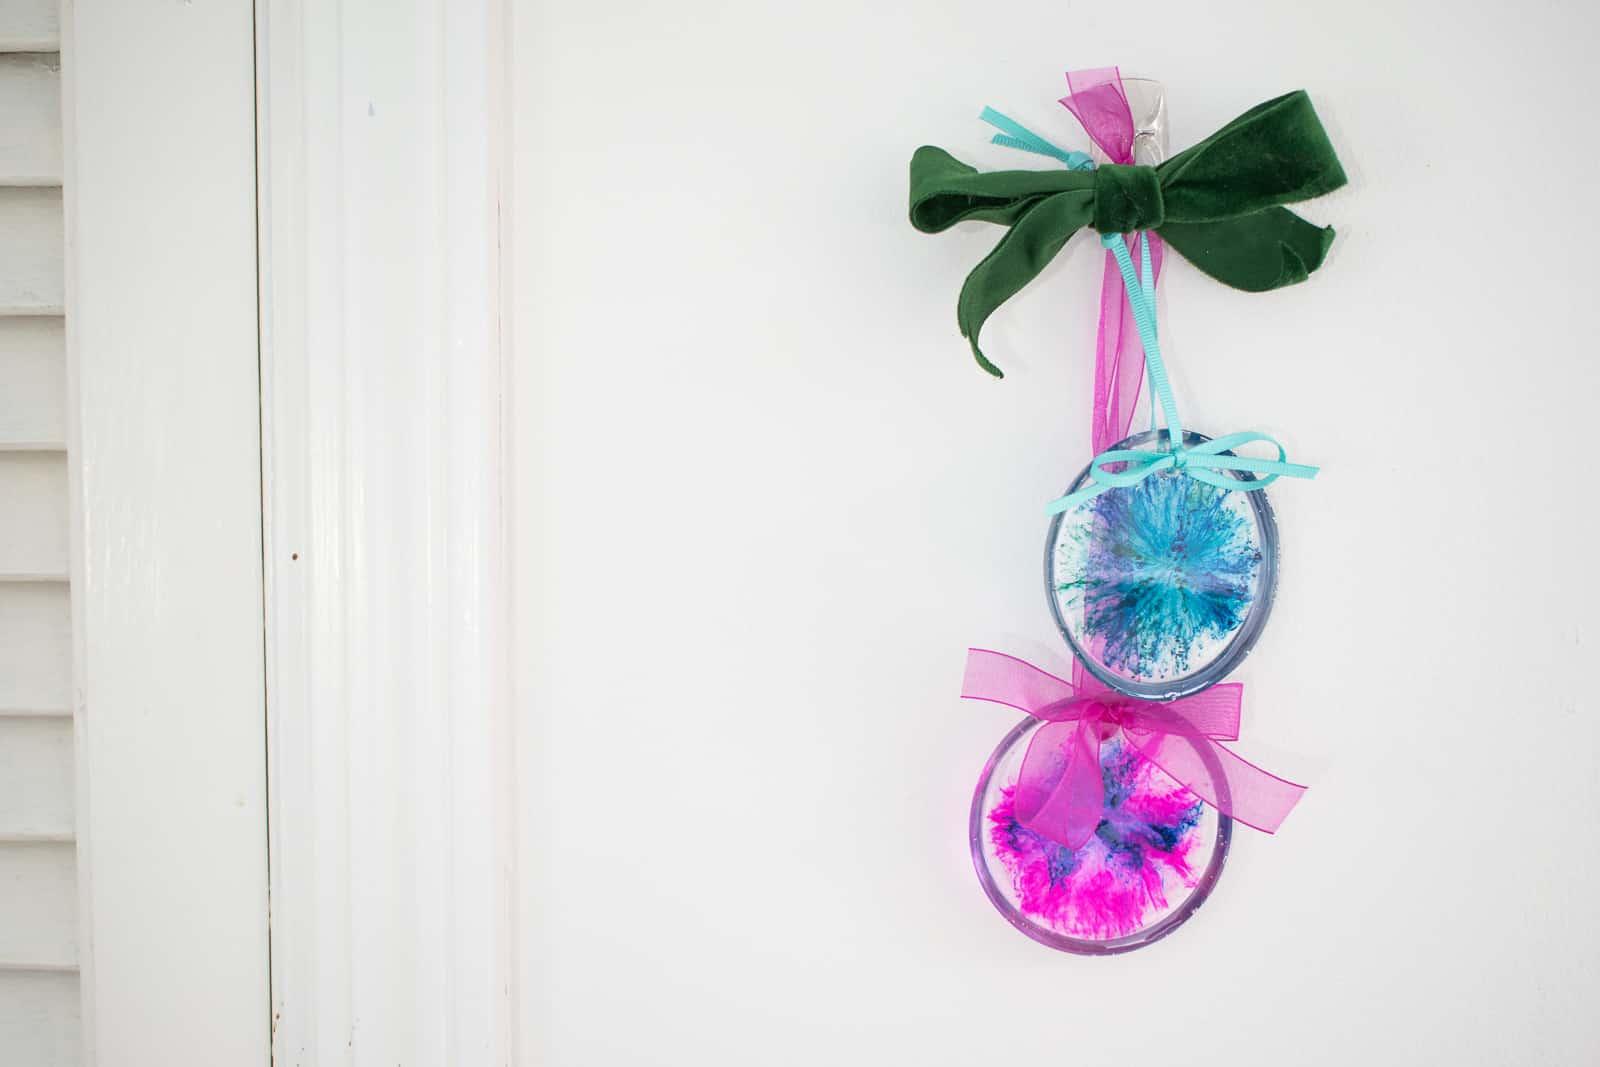 epoxy pour resin ornament